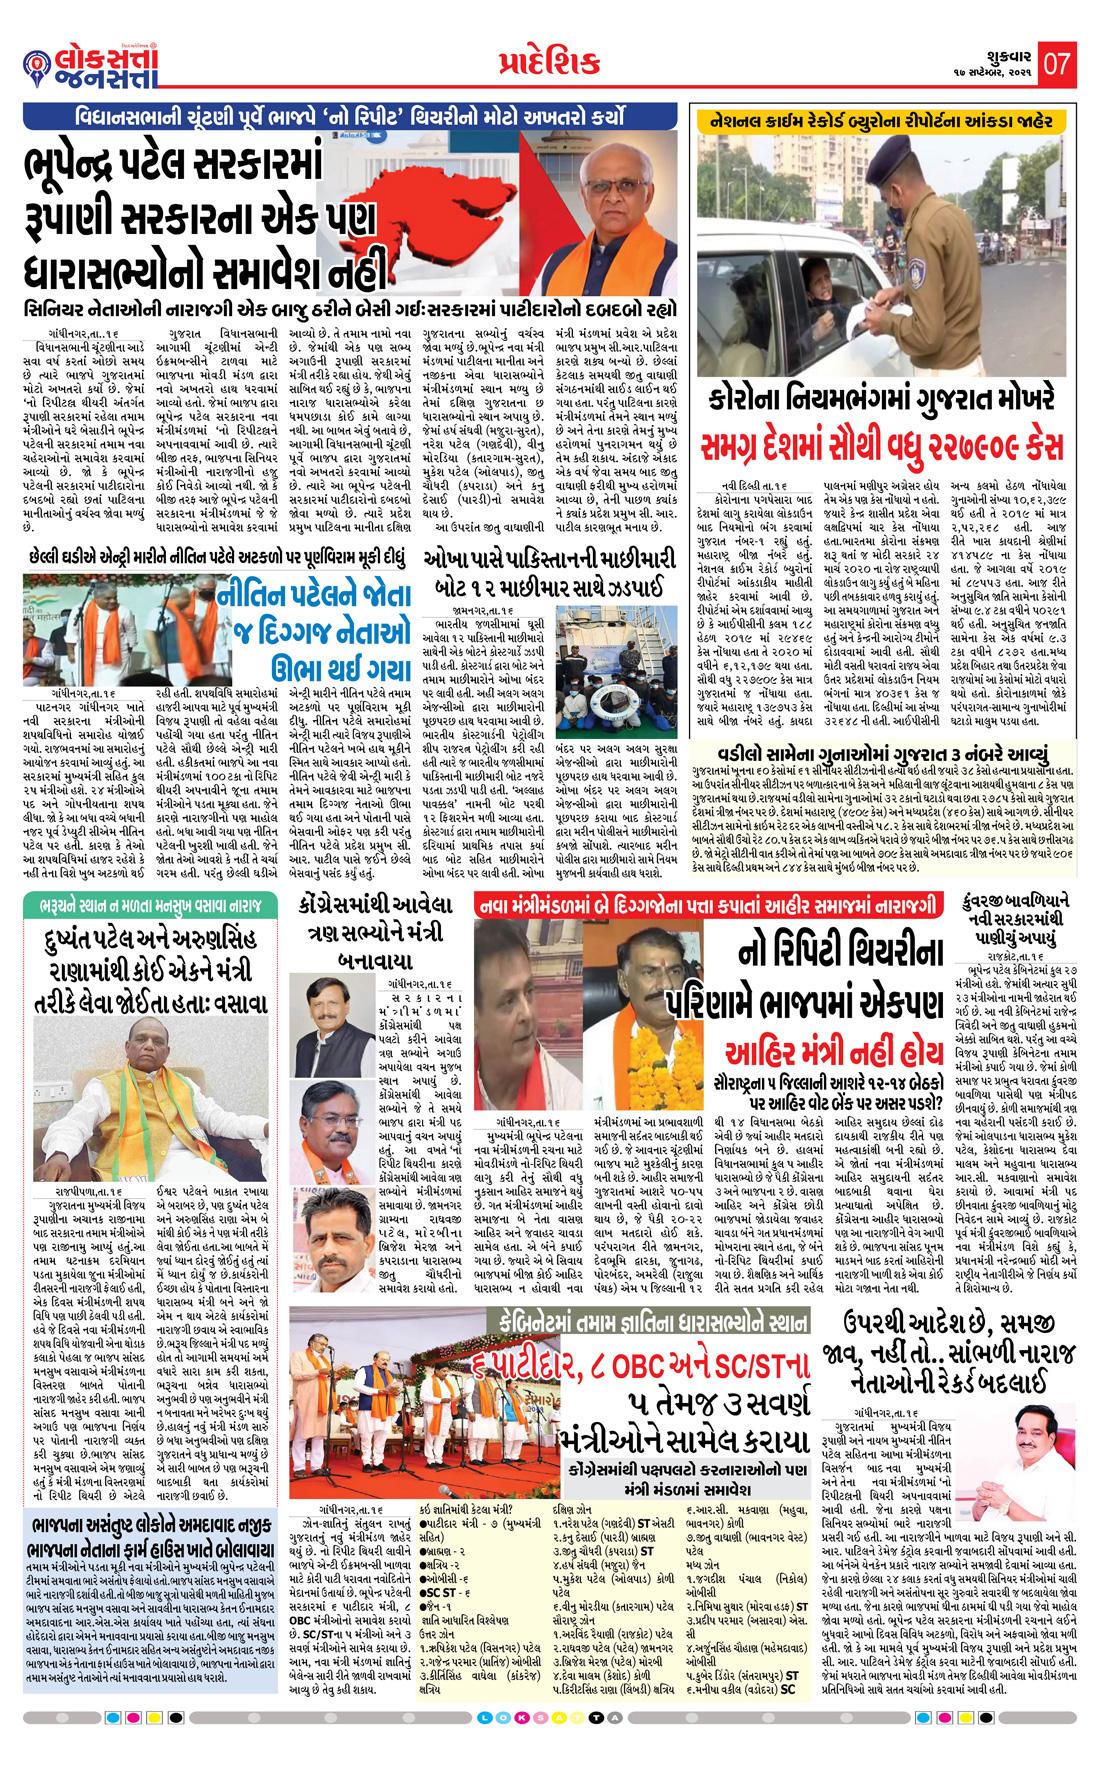 Loksatta Jansatta News Papaer E-paper dated 2021-09-17   Page 7